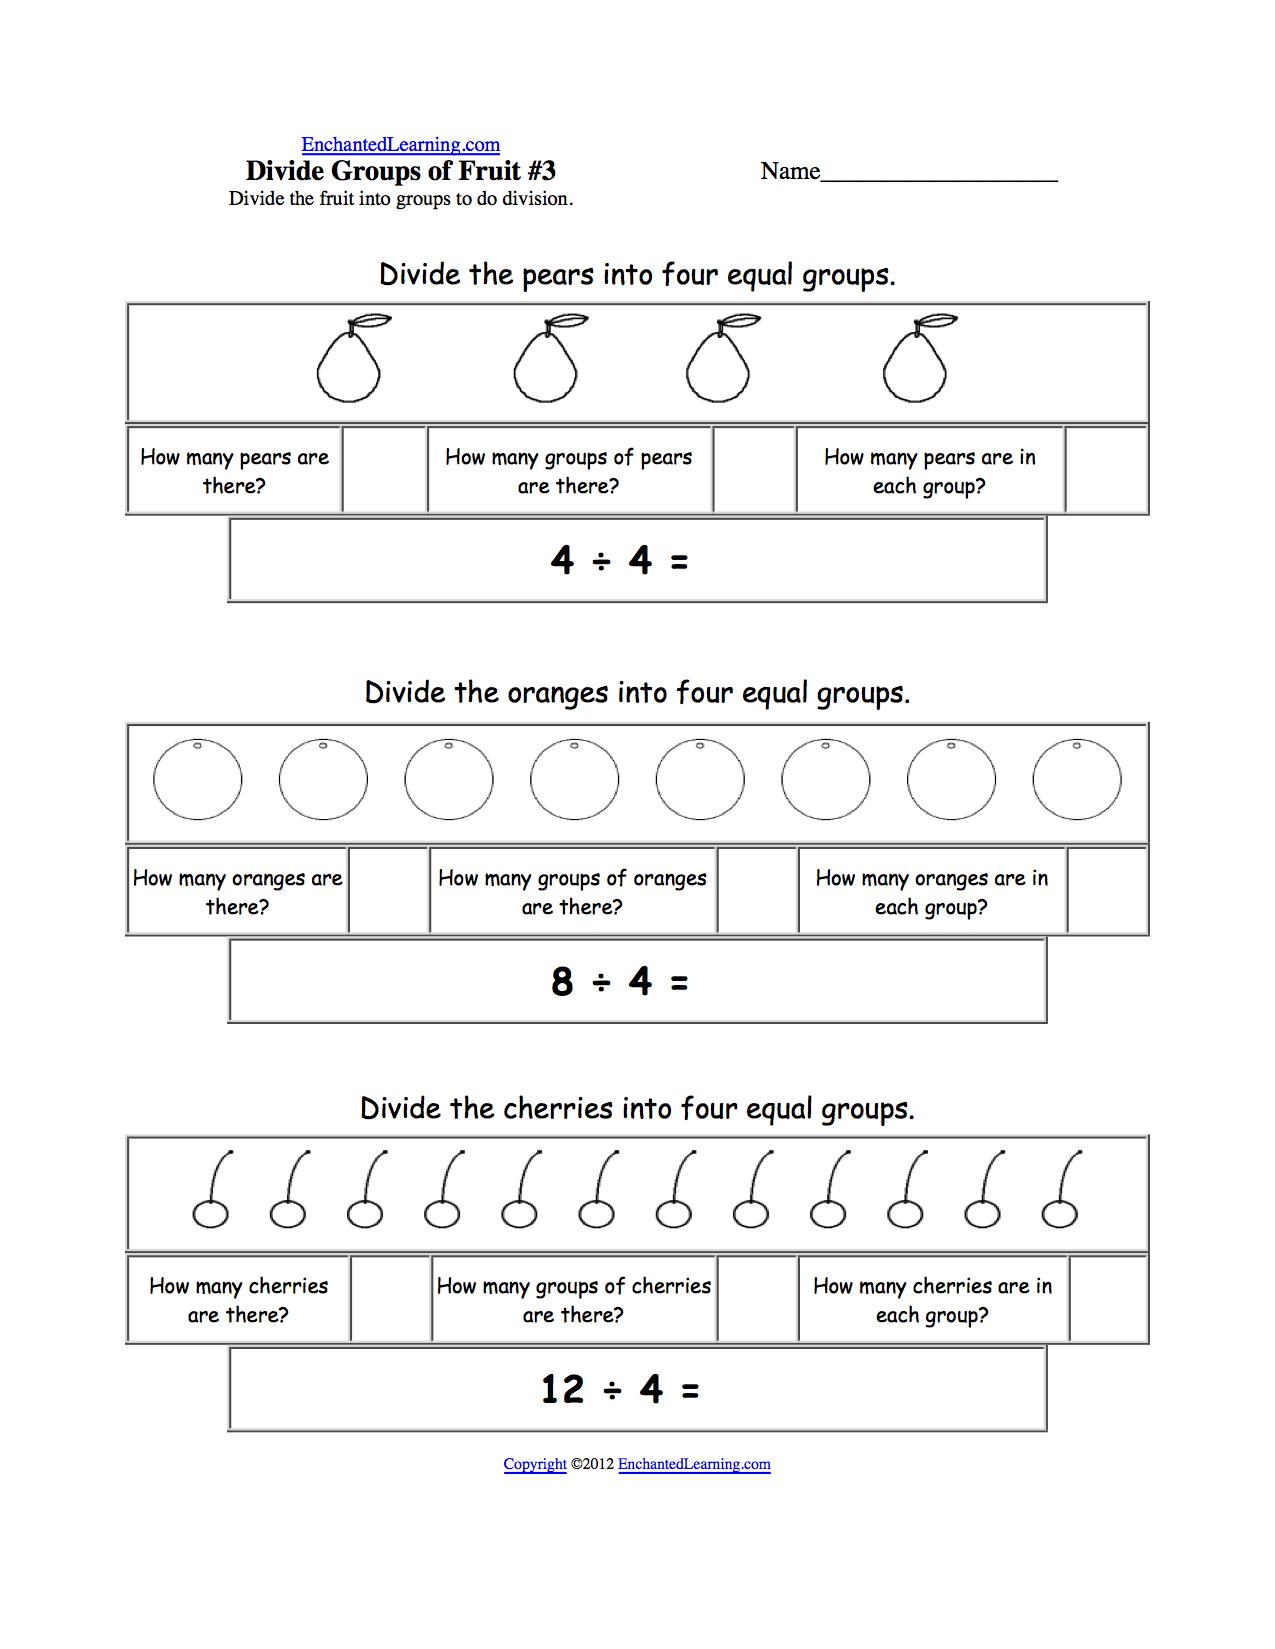 visual division printouts  enchantedlearningcom divide fruit into four groups